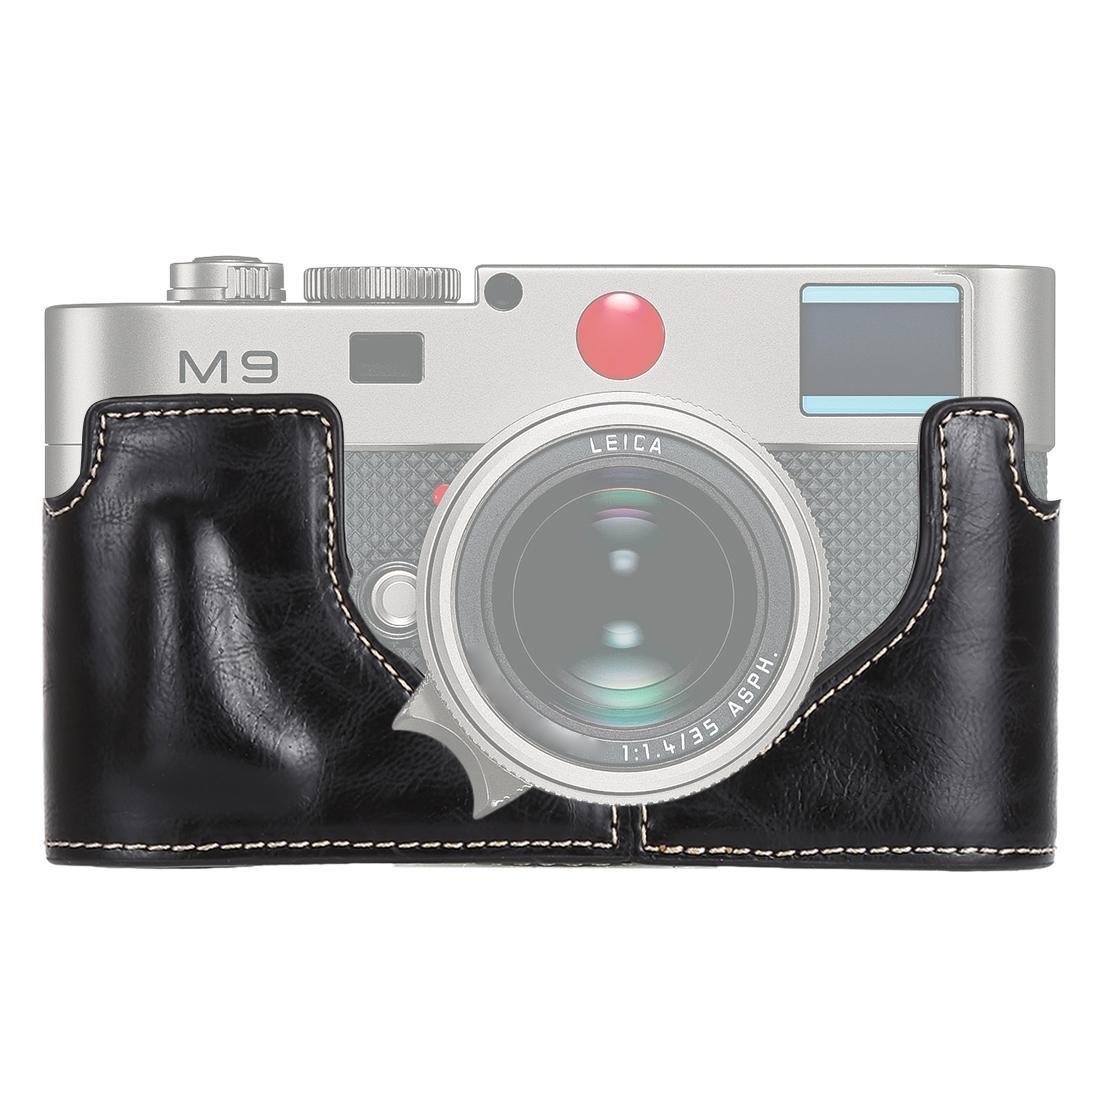 Azul Metal Suave Disparador Para Leica Contax Fujifilm X100 Tamaño S